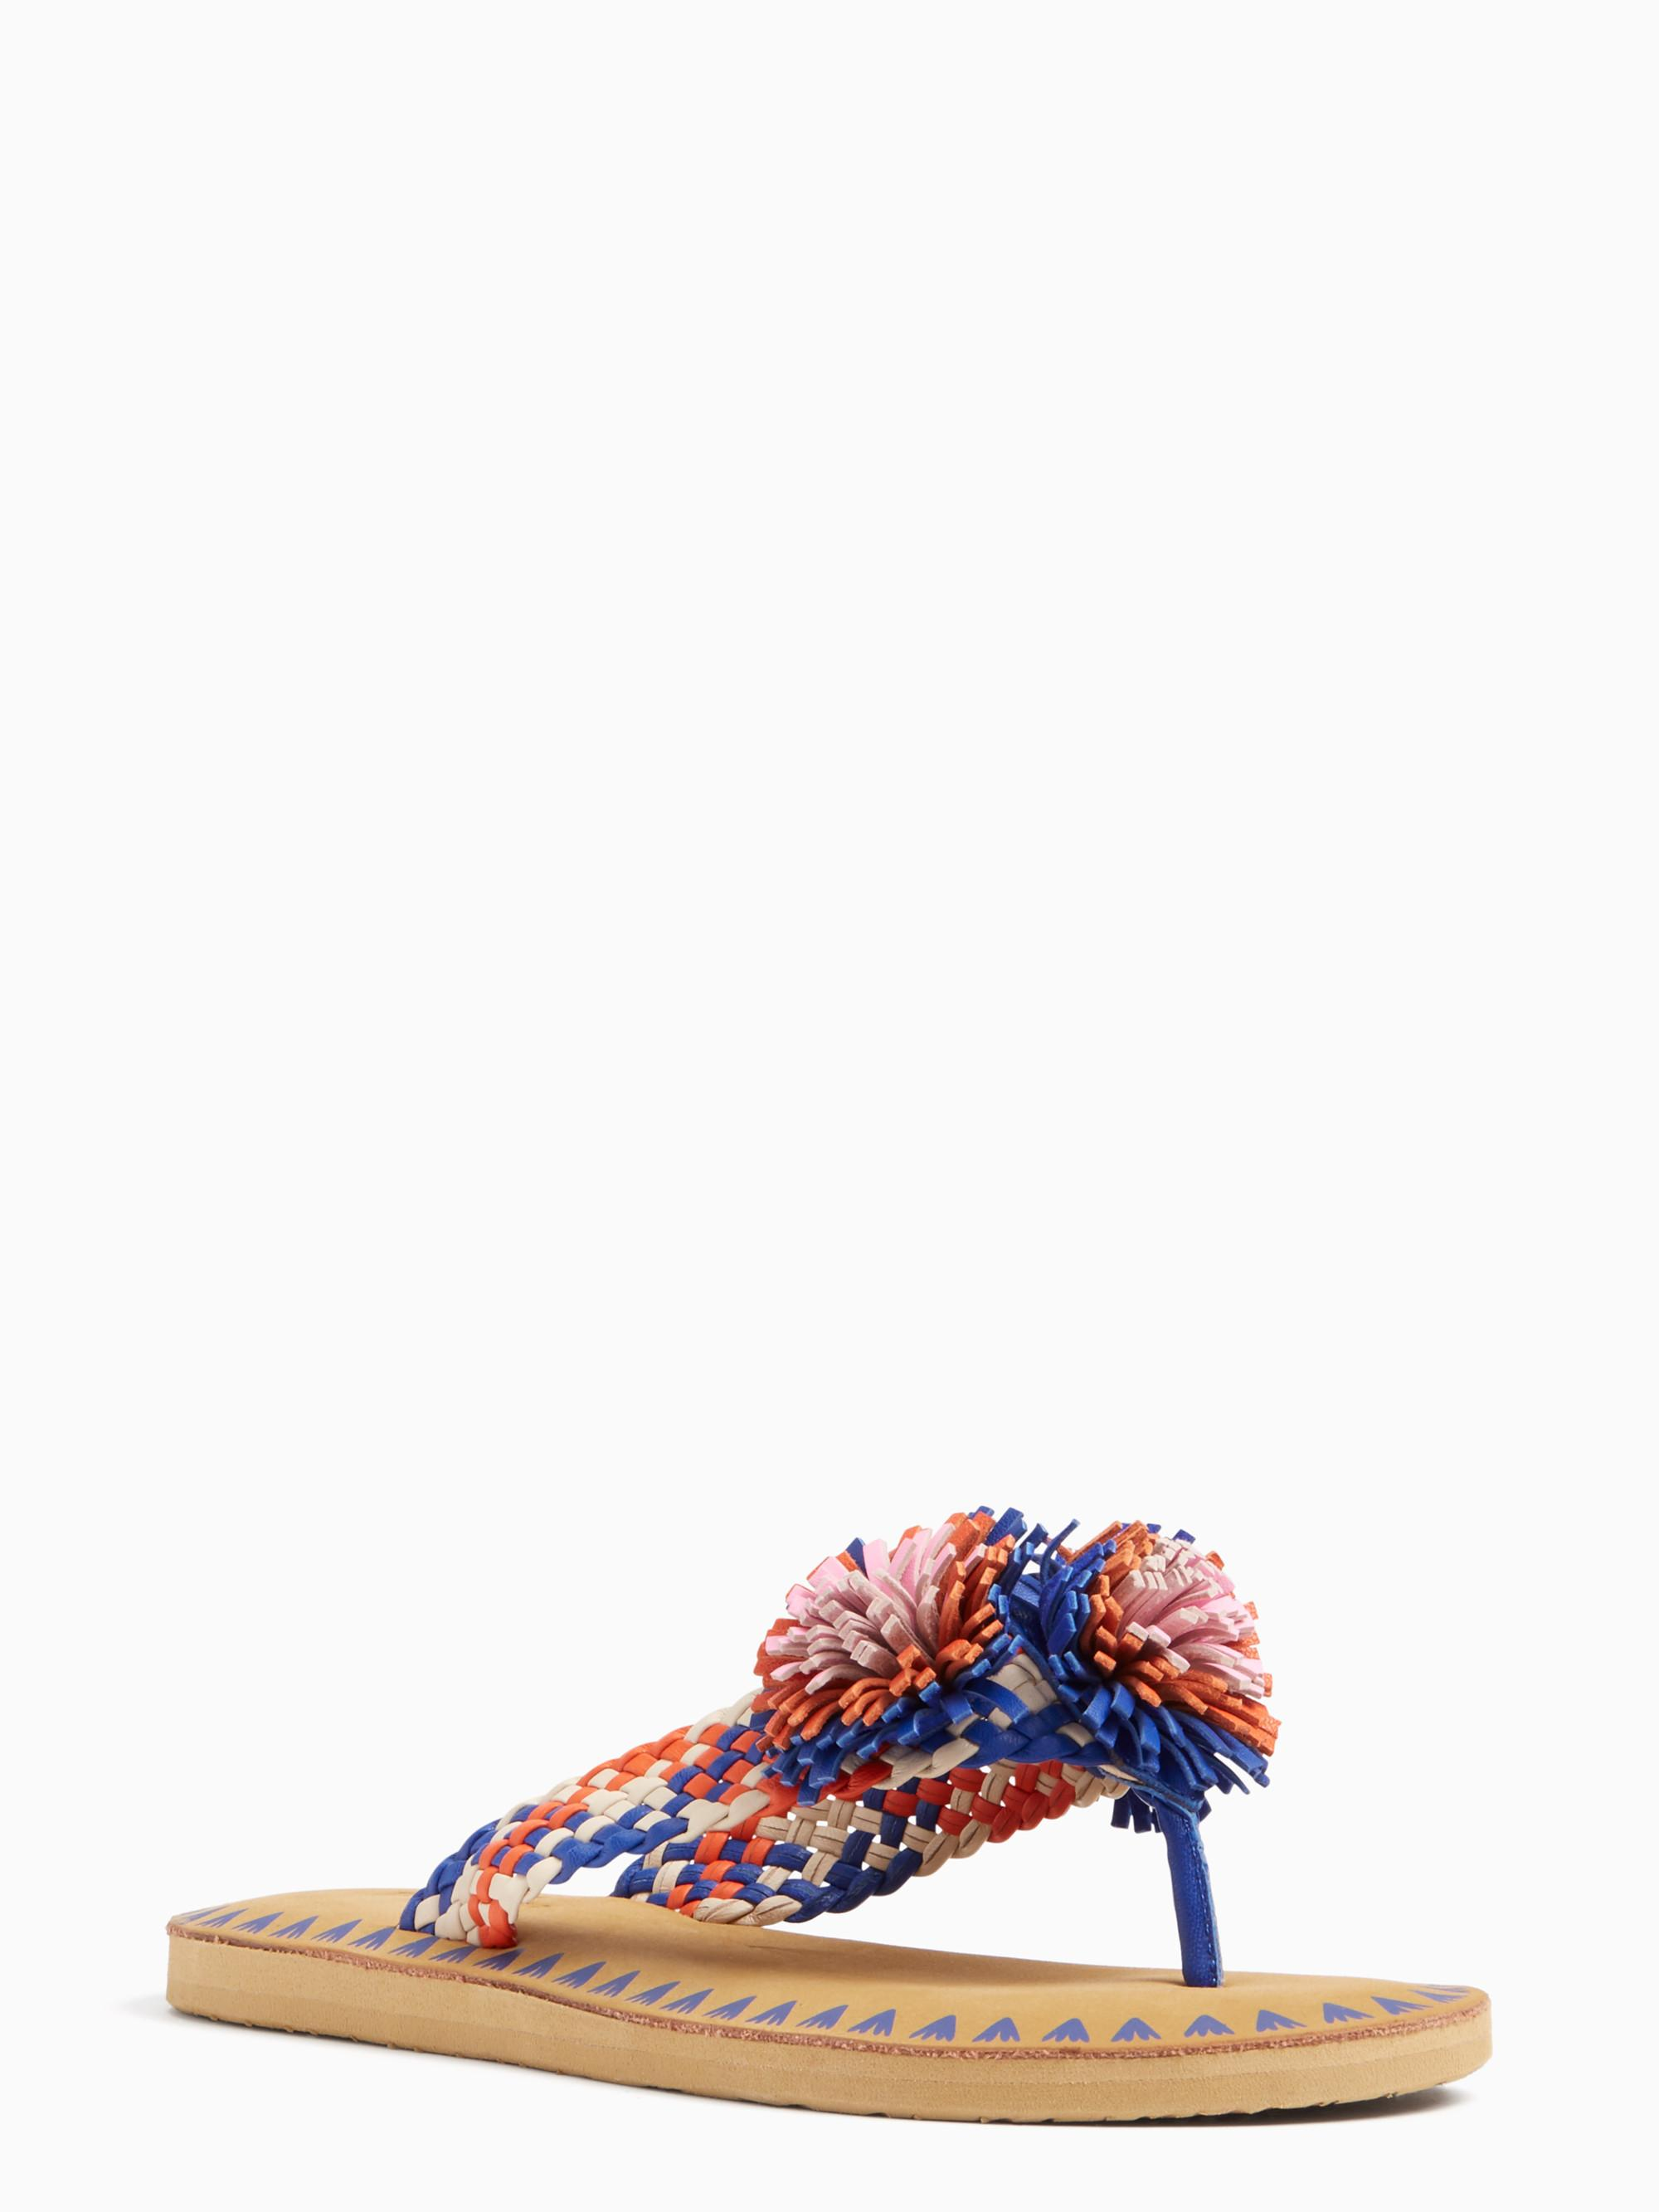 01bbe657cc9f Lyst - Kate Spade Idette Sandals in Blue